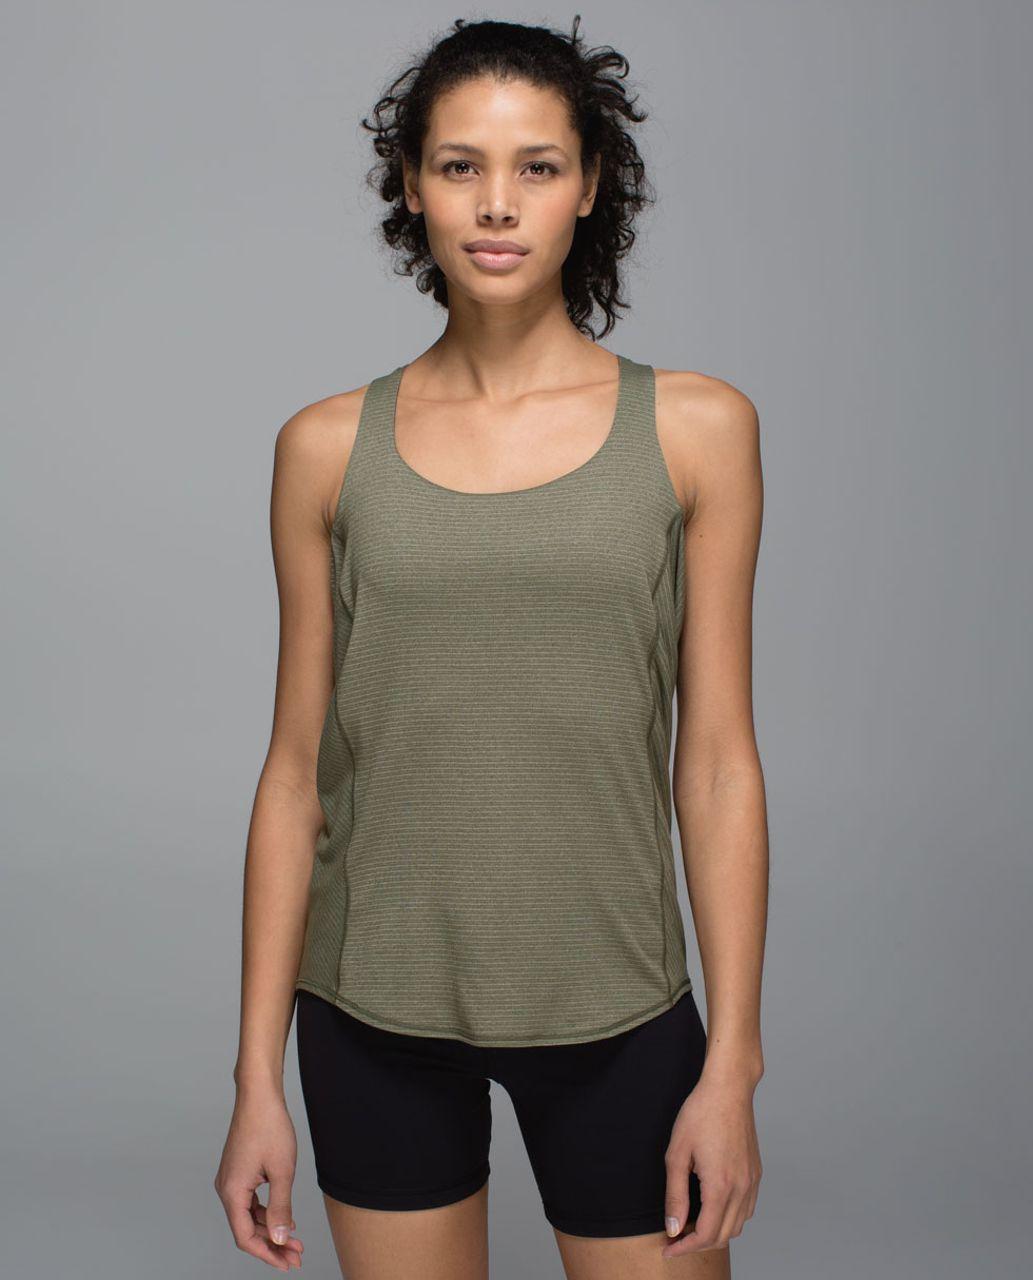 Lululemon Wild Tank - Heathered Fatigue Green / Mystic Jungle Fatigue Green Black